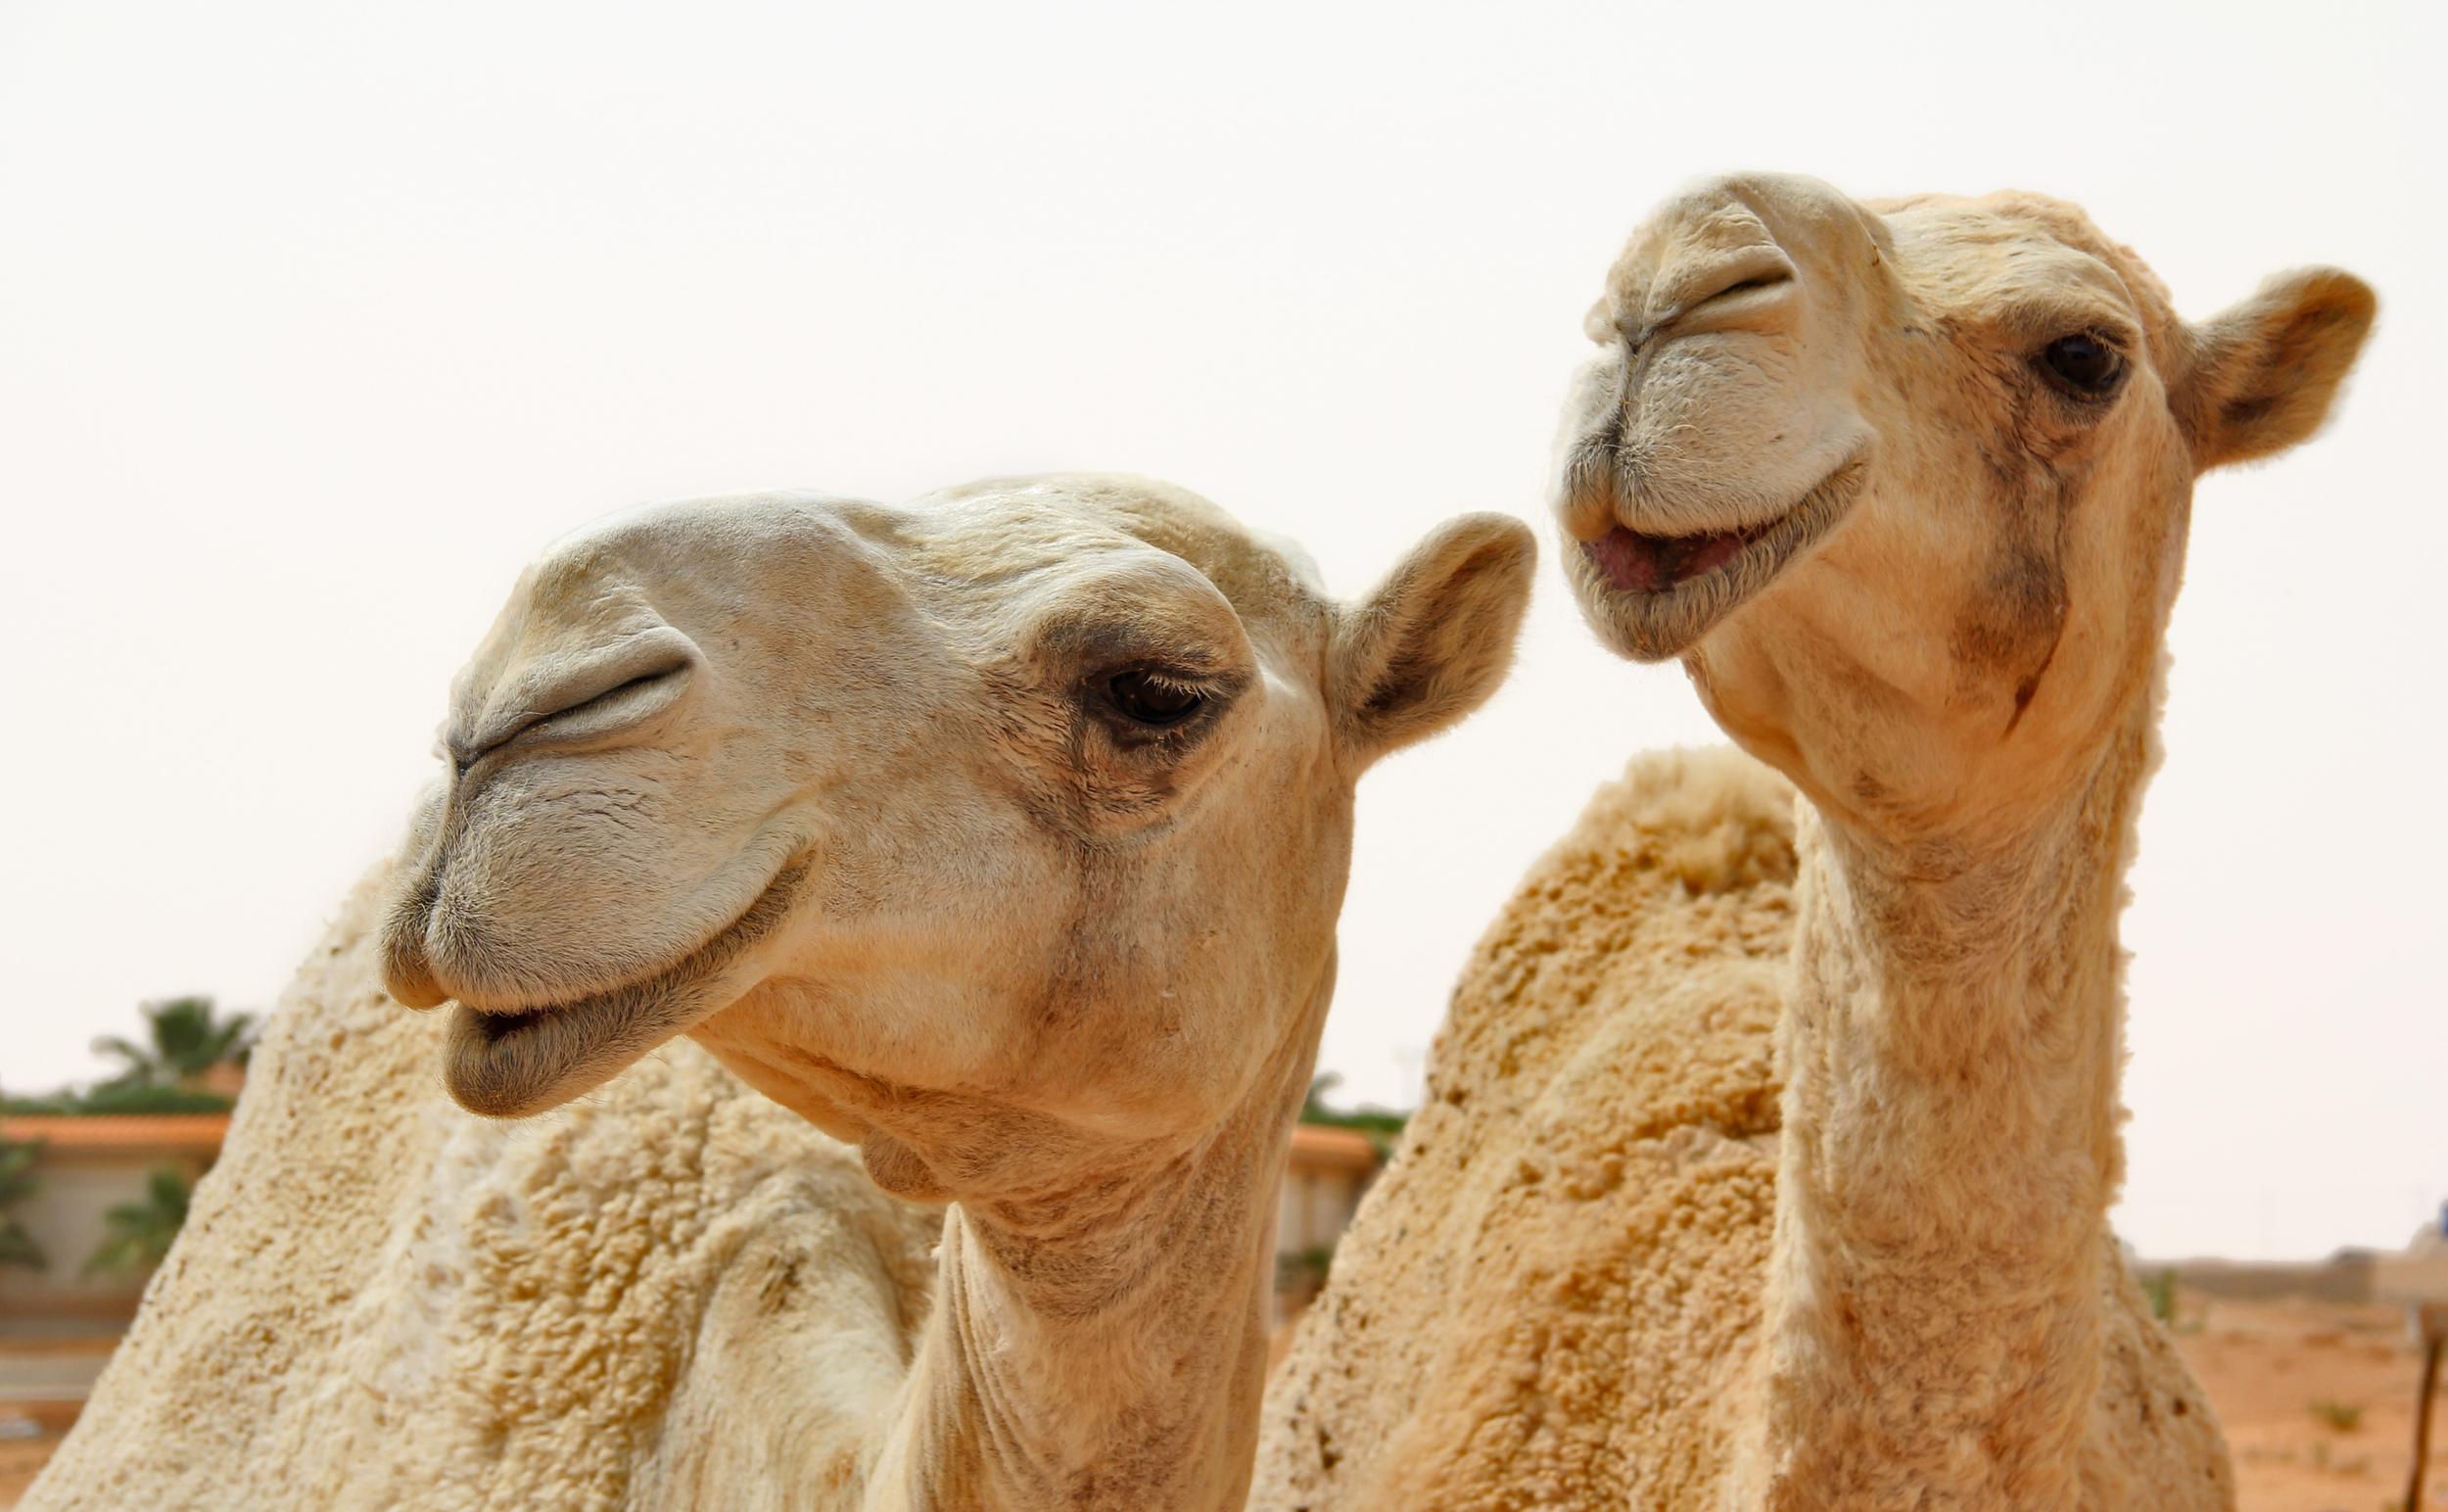 saudi camel 1.jpg